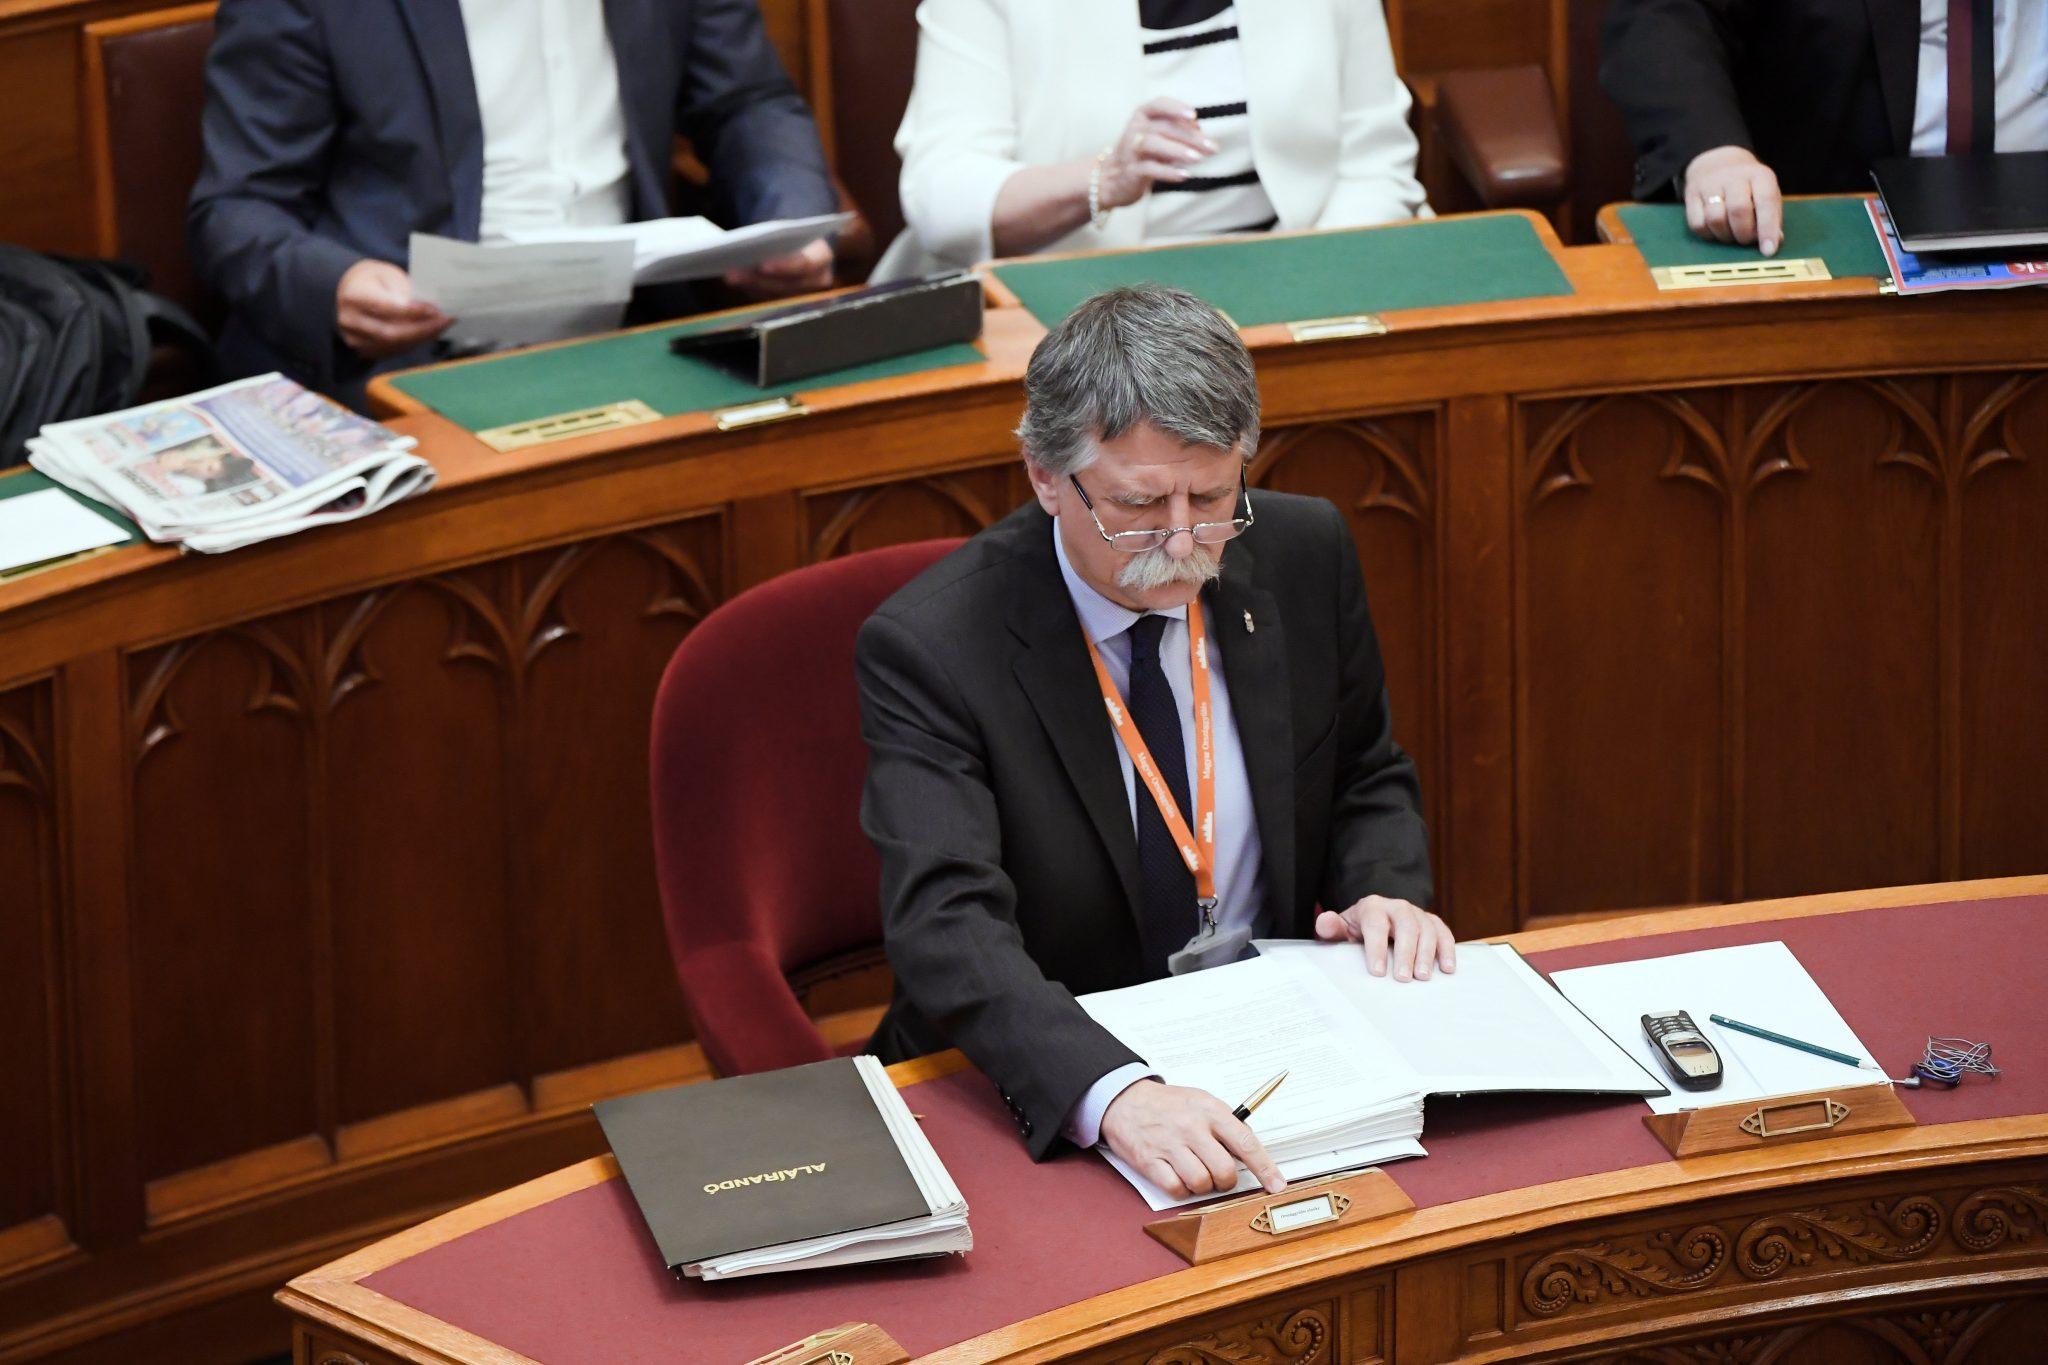 house speaker voting parliament